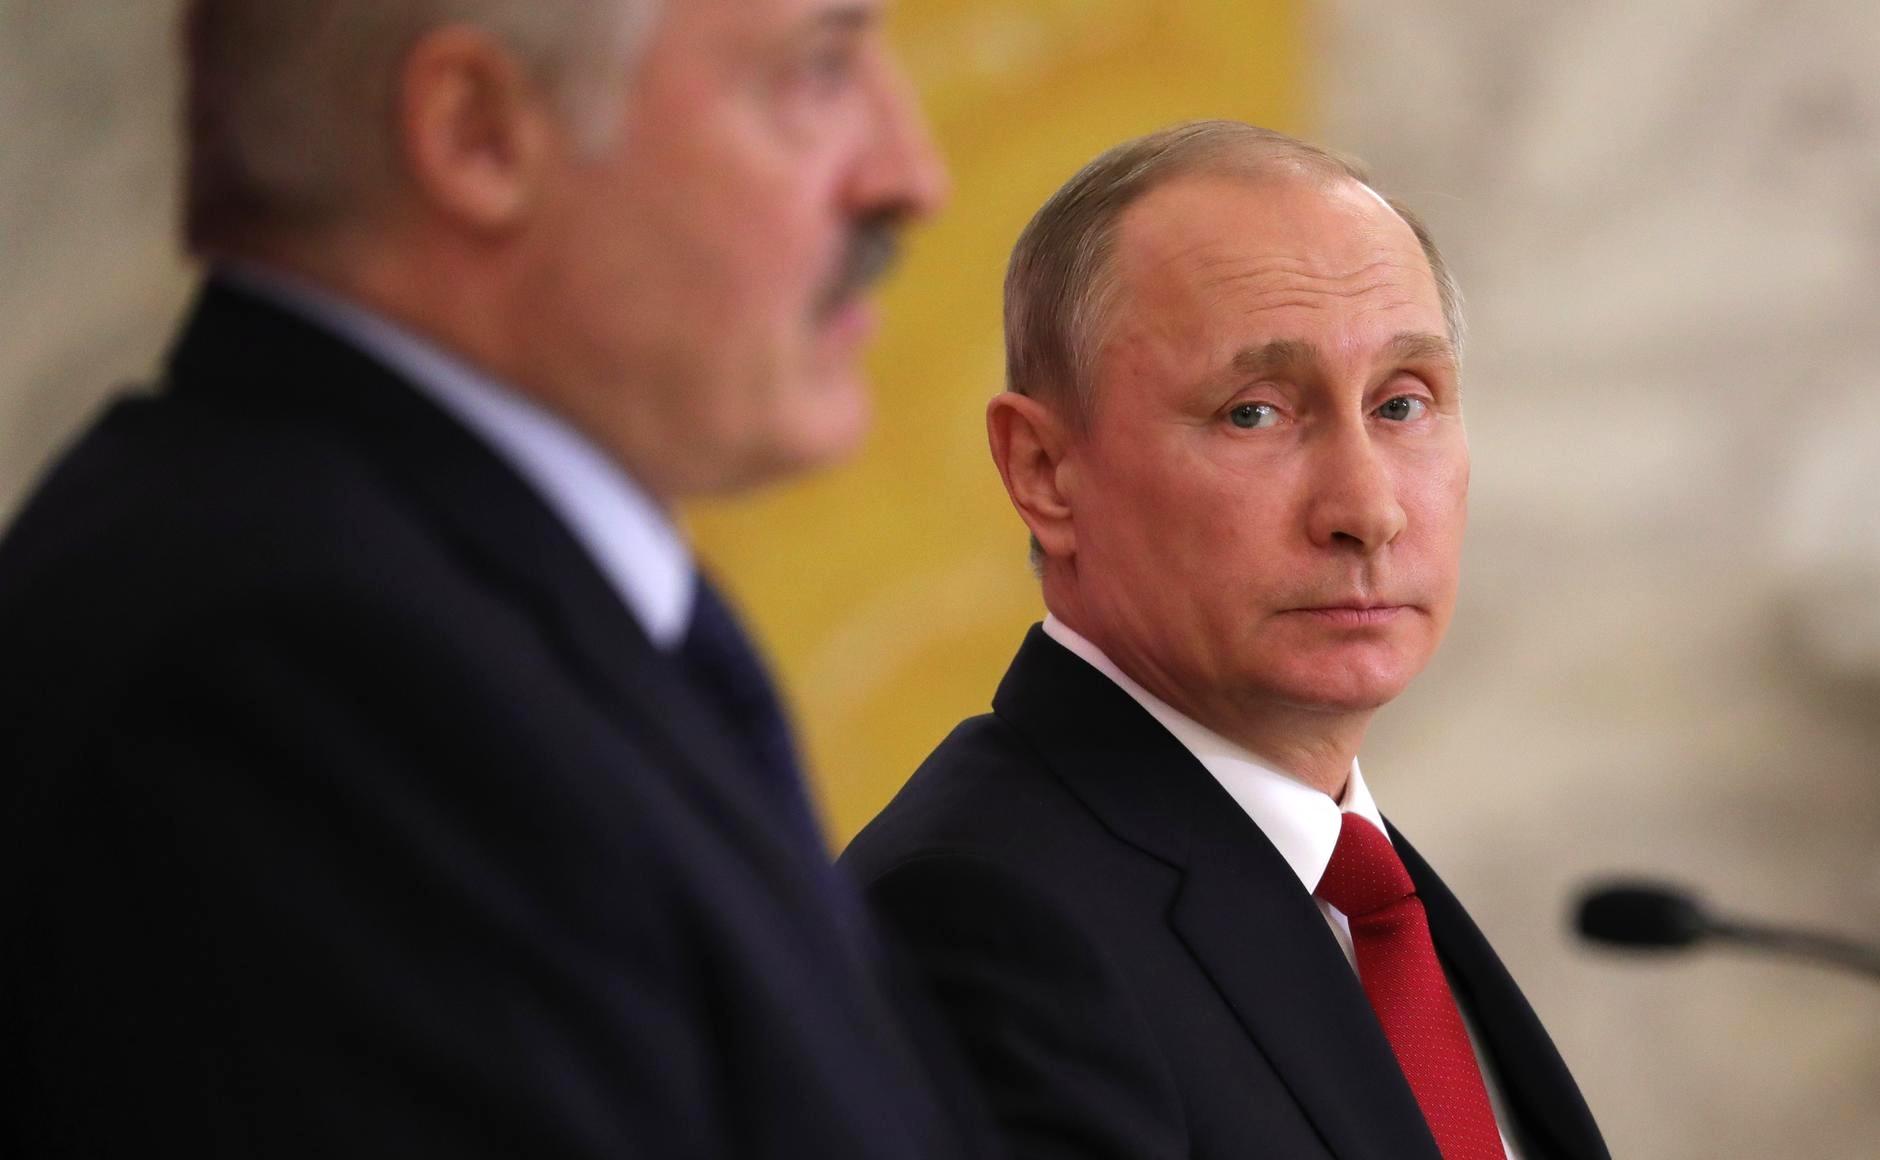 Vladimir Putin and Alexander Lukashenko met on April 3, 2017 in St. Petersburg.